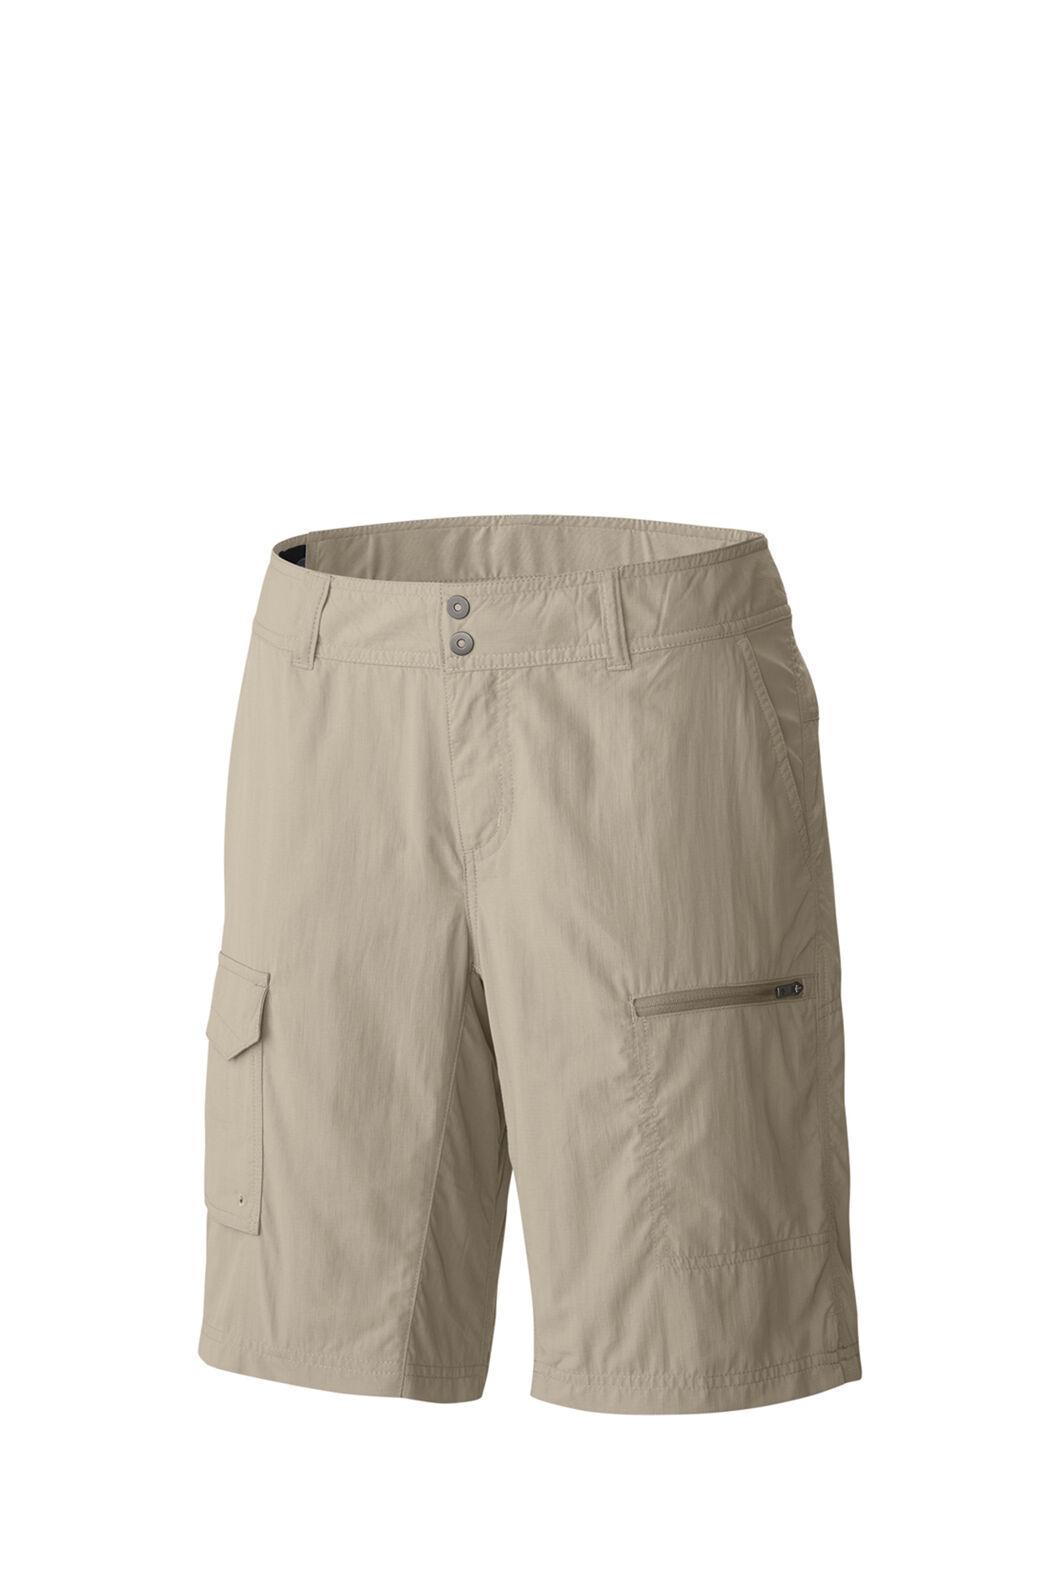 Columbia Silver Ridge™ Cargo Shorts — Women's, Fossil, hi-res